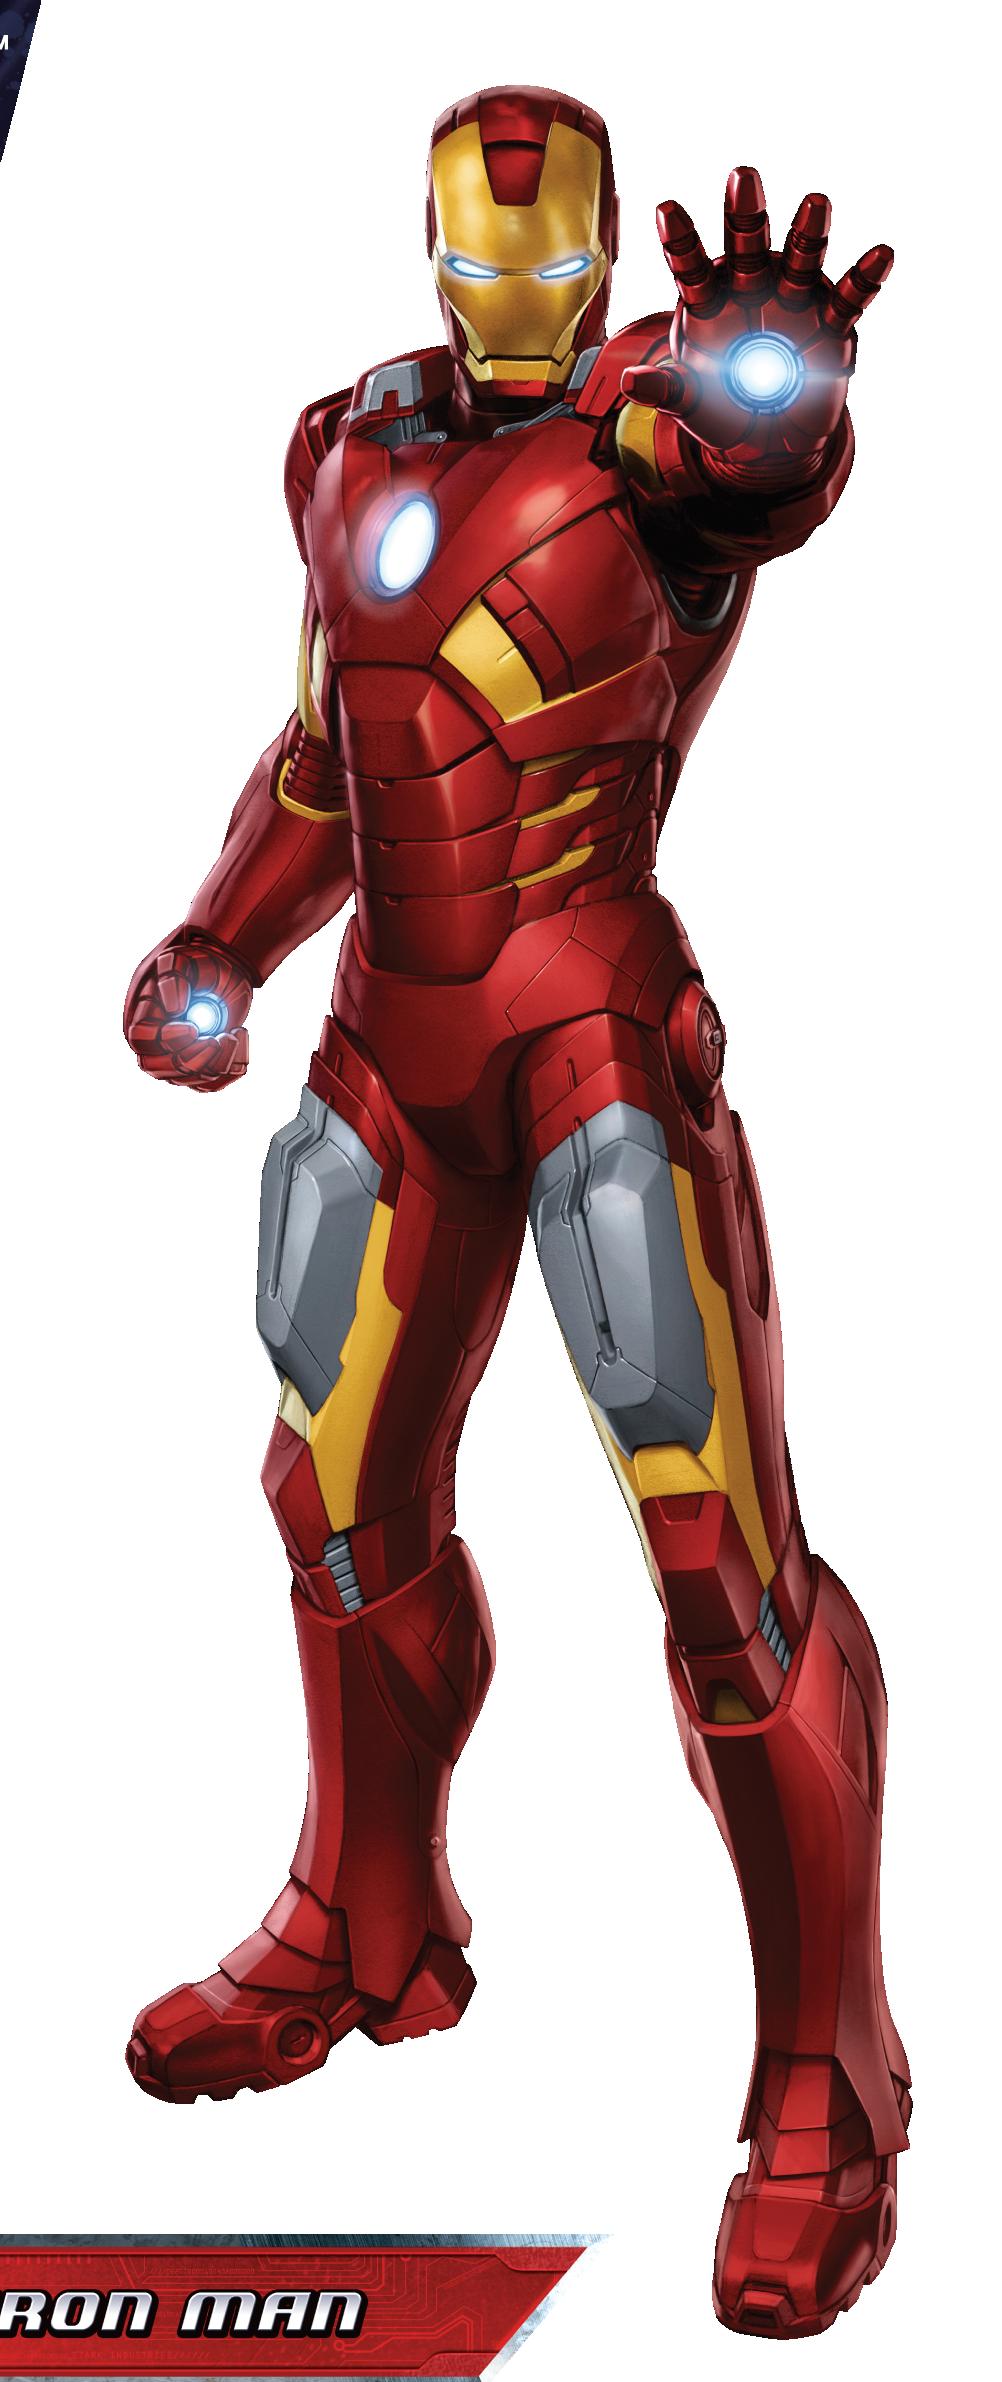 Iron Man by steeven7620 on DeviantArt